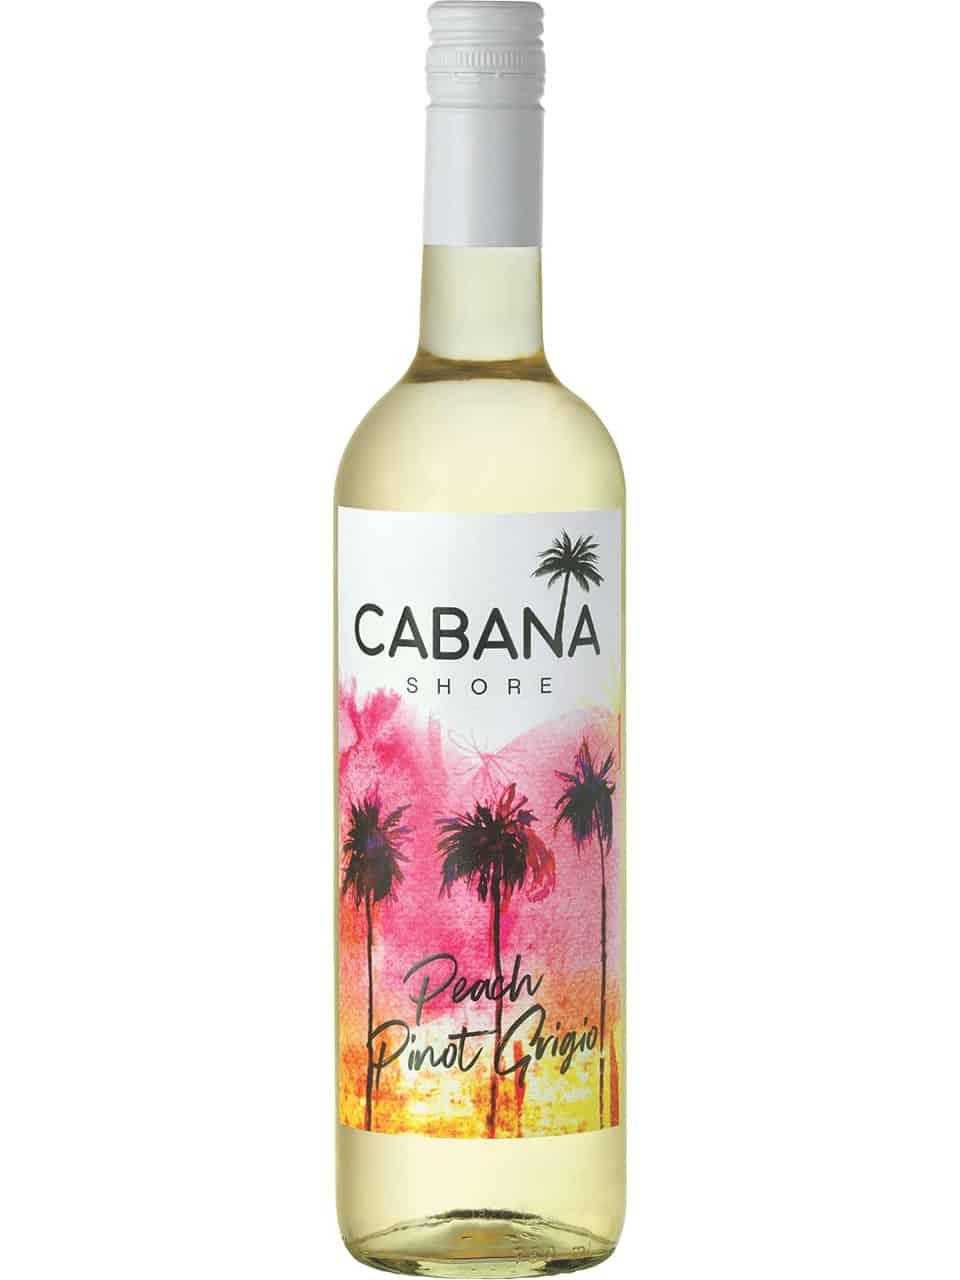 Cabana Shore Peach Pinot Grigio